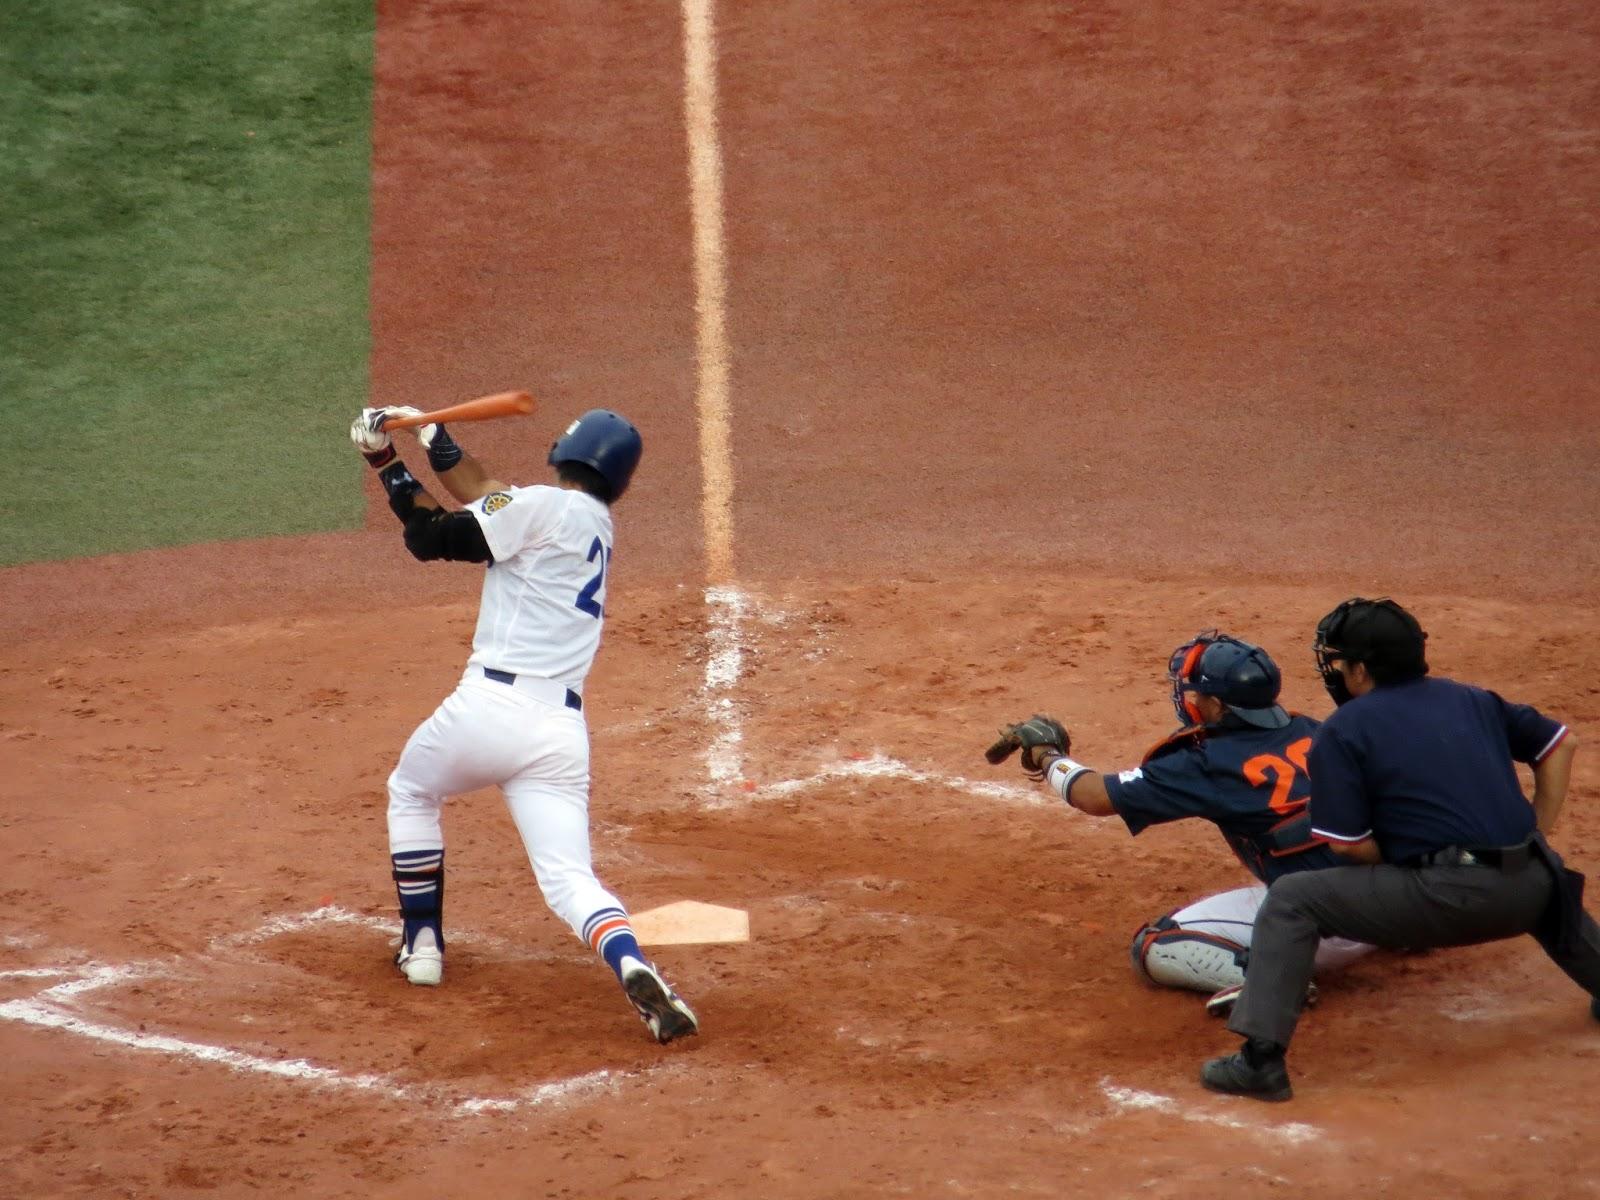 Baseball tokyo, Japan, nippon, baseball, must do tokyo